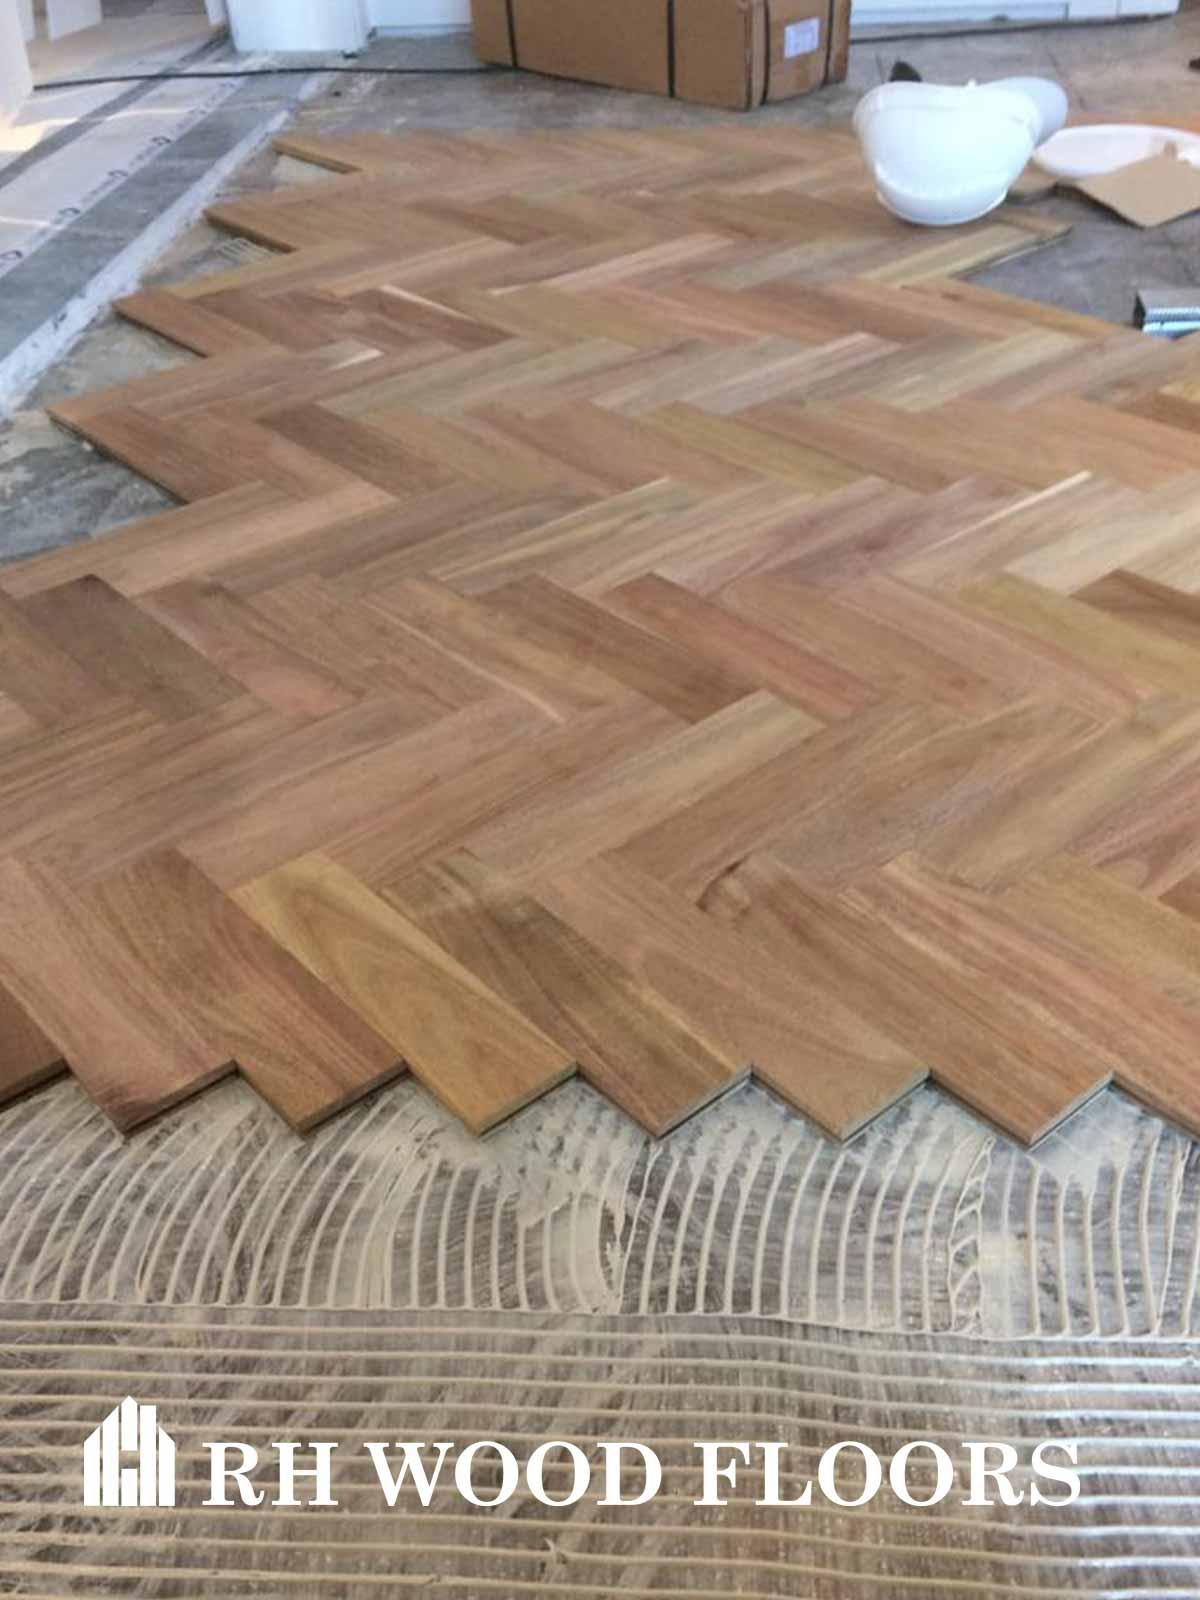 Dylan hotel parquet install Rh Wood Floor company